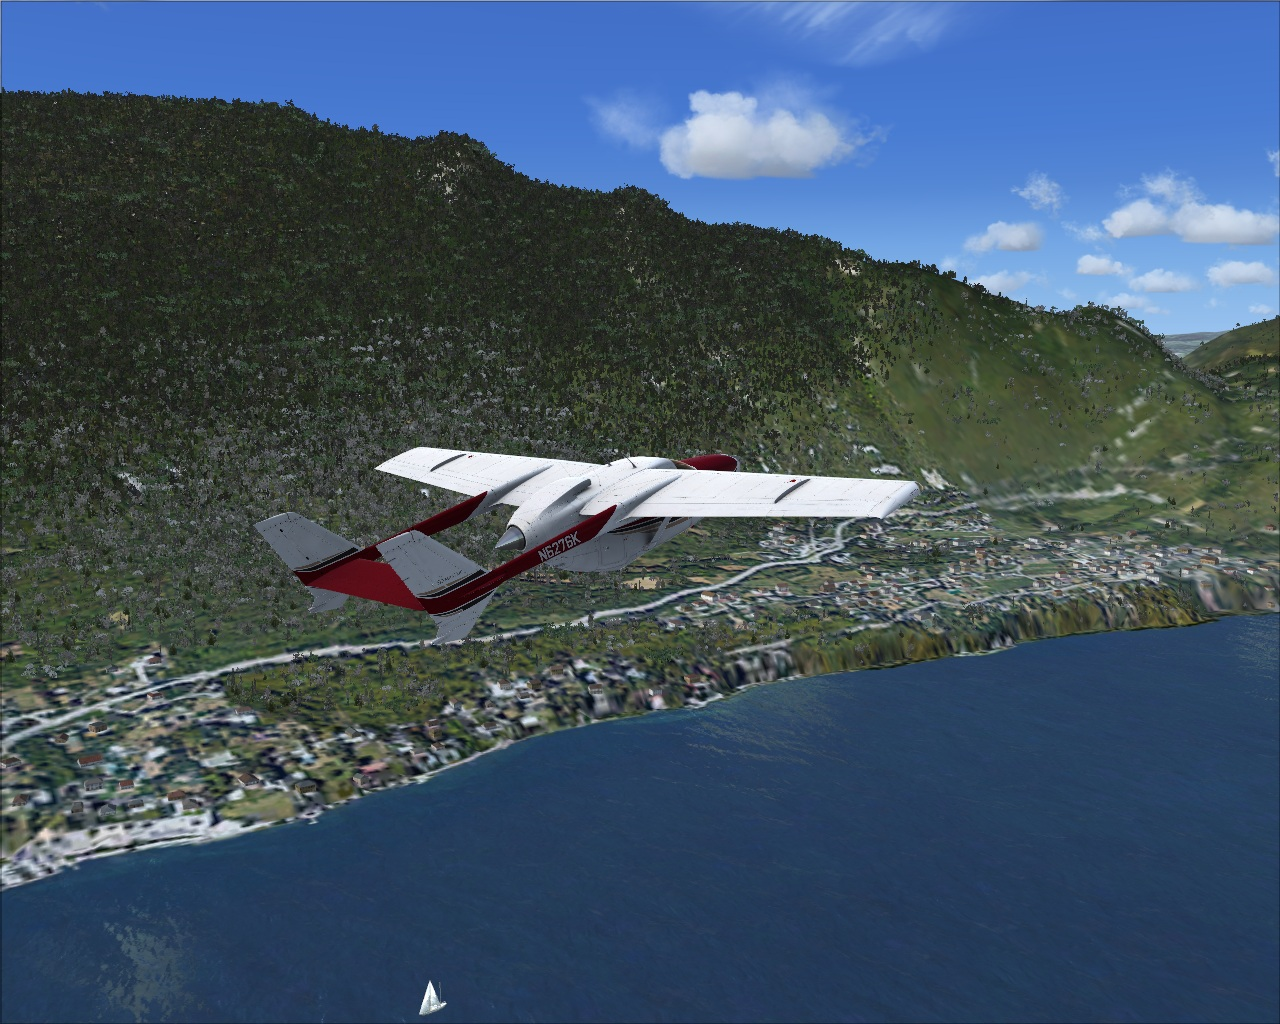 The Alpes Fsx